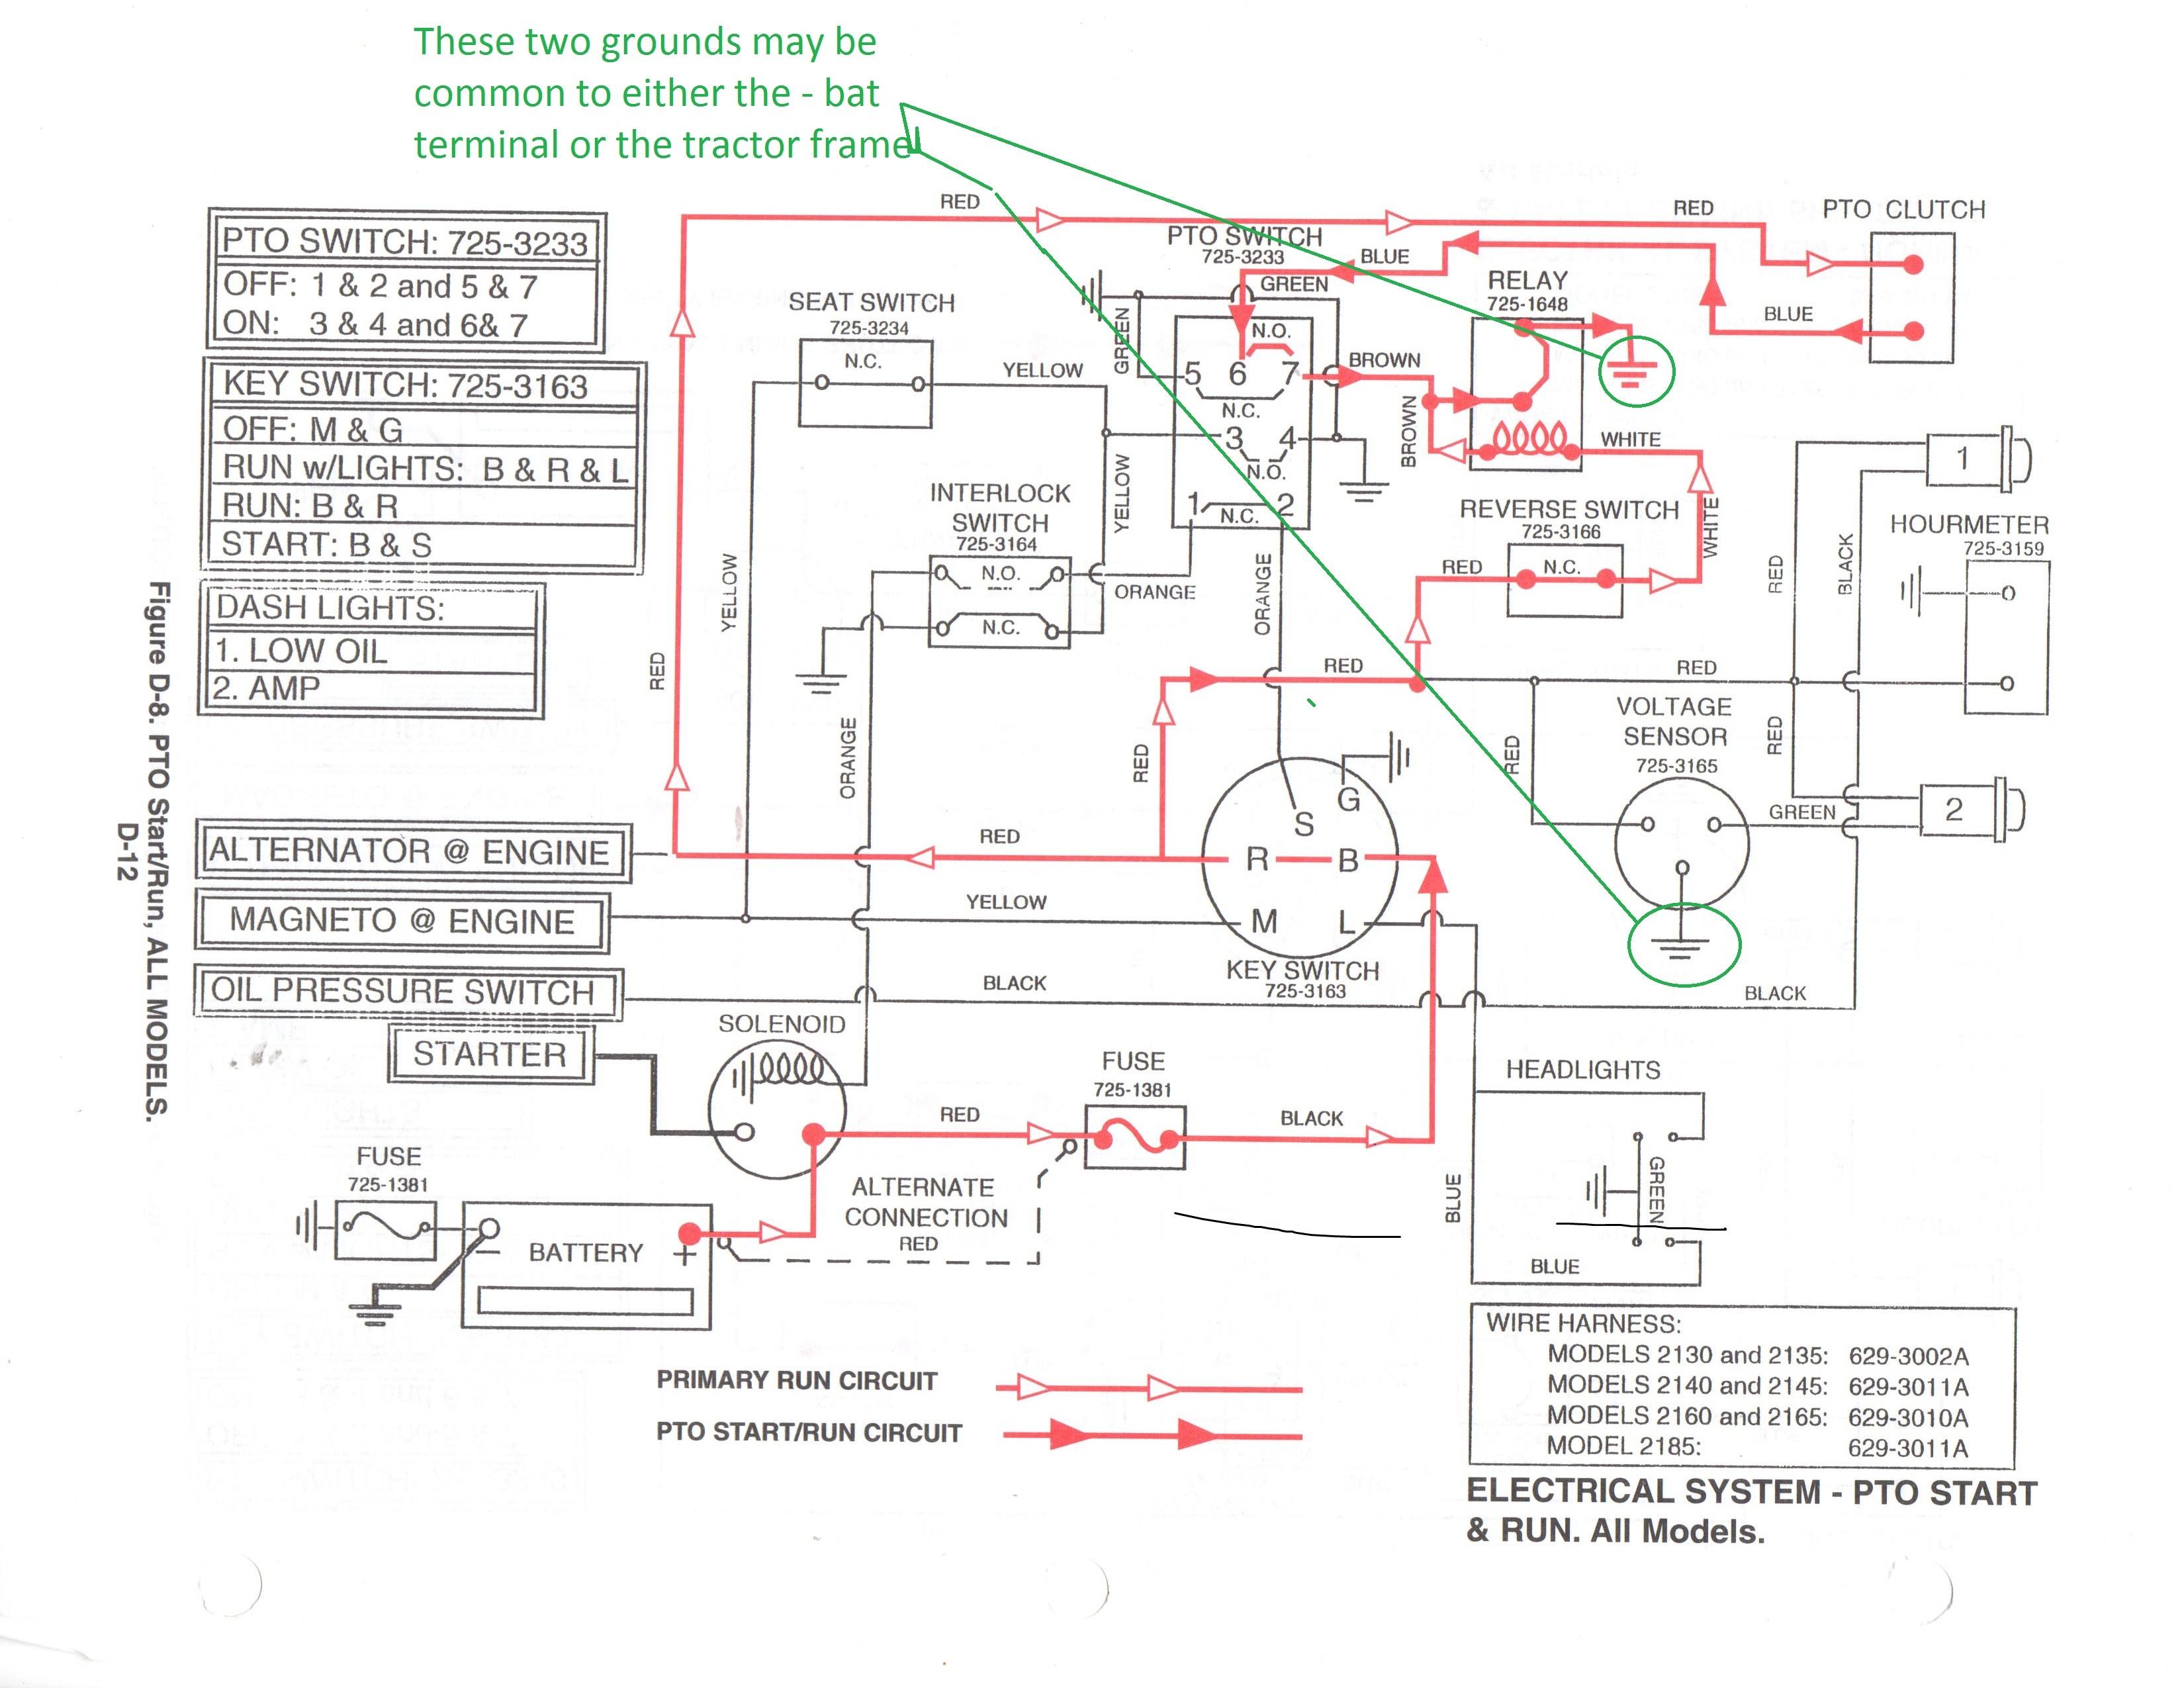 John Deere Gx345 Electrical Diagrams Scotts 1742g Wiring Diagram Of John Deere Gx345 Electrical Diagrams